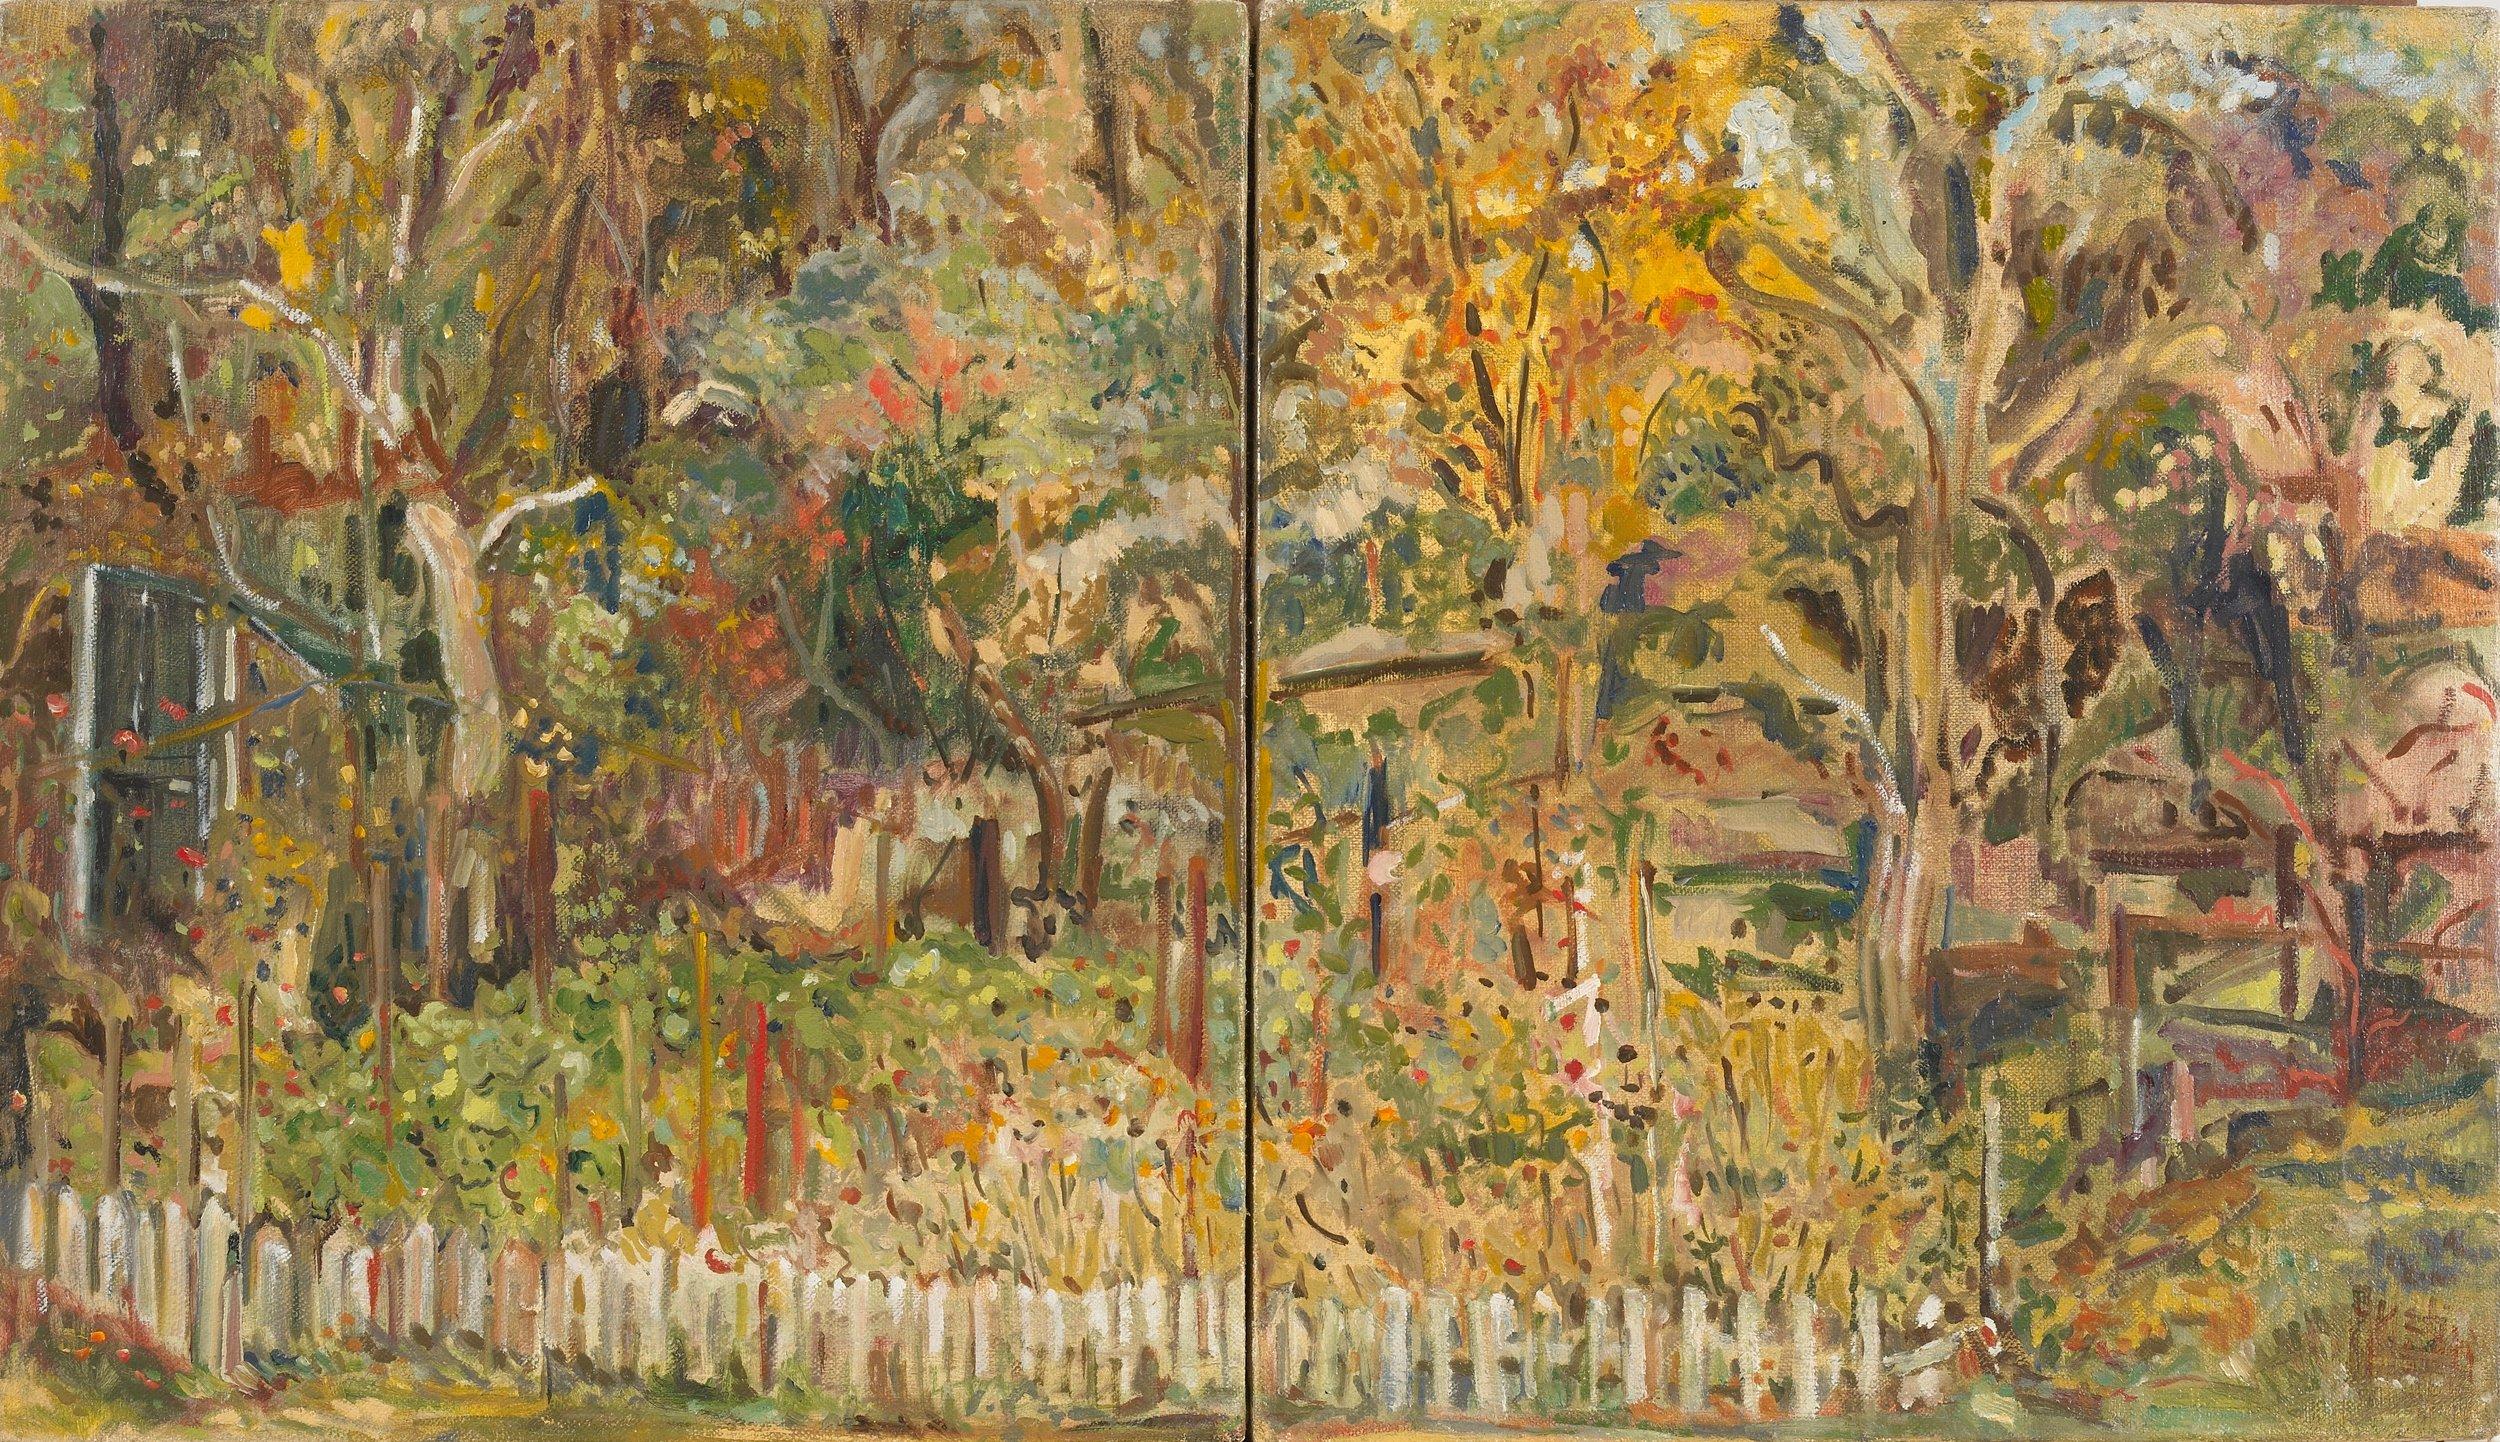 Harriet's Garden in Two Parts  24X14 - Oil on Canvas